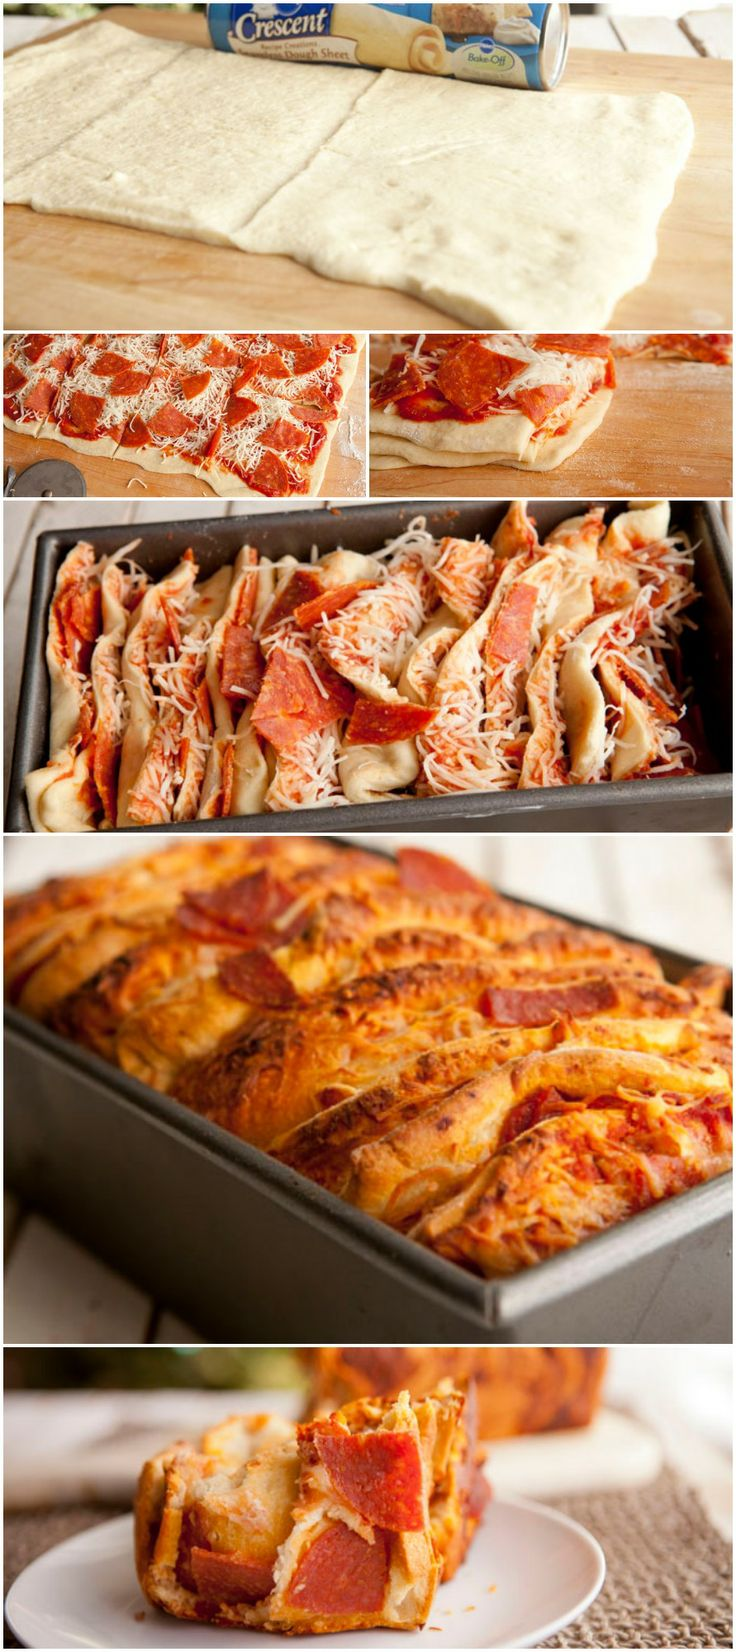 Layered Pepperoni Pizza Pull-Apart Loaf #pillsbury